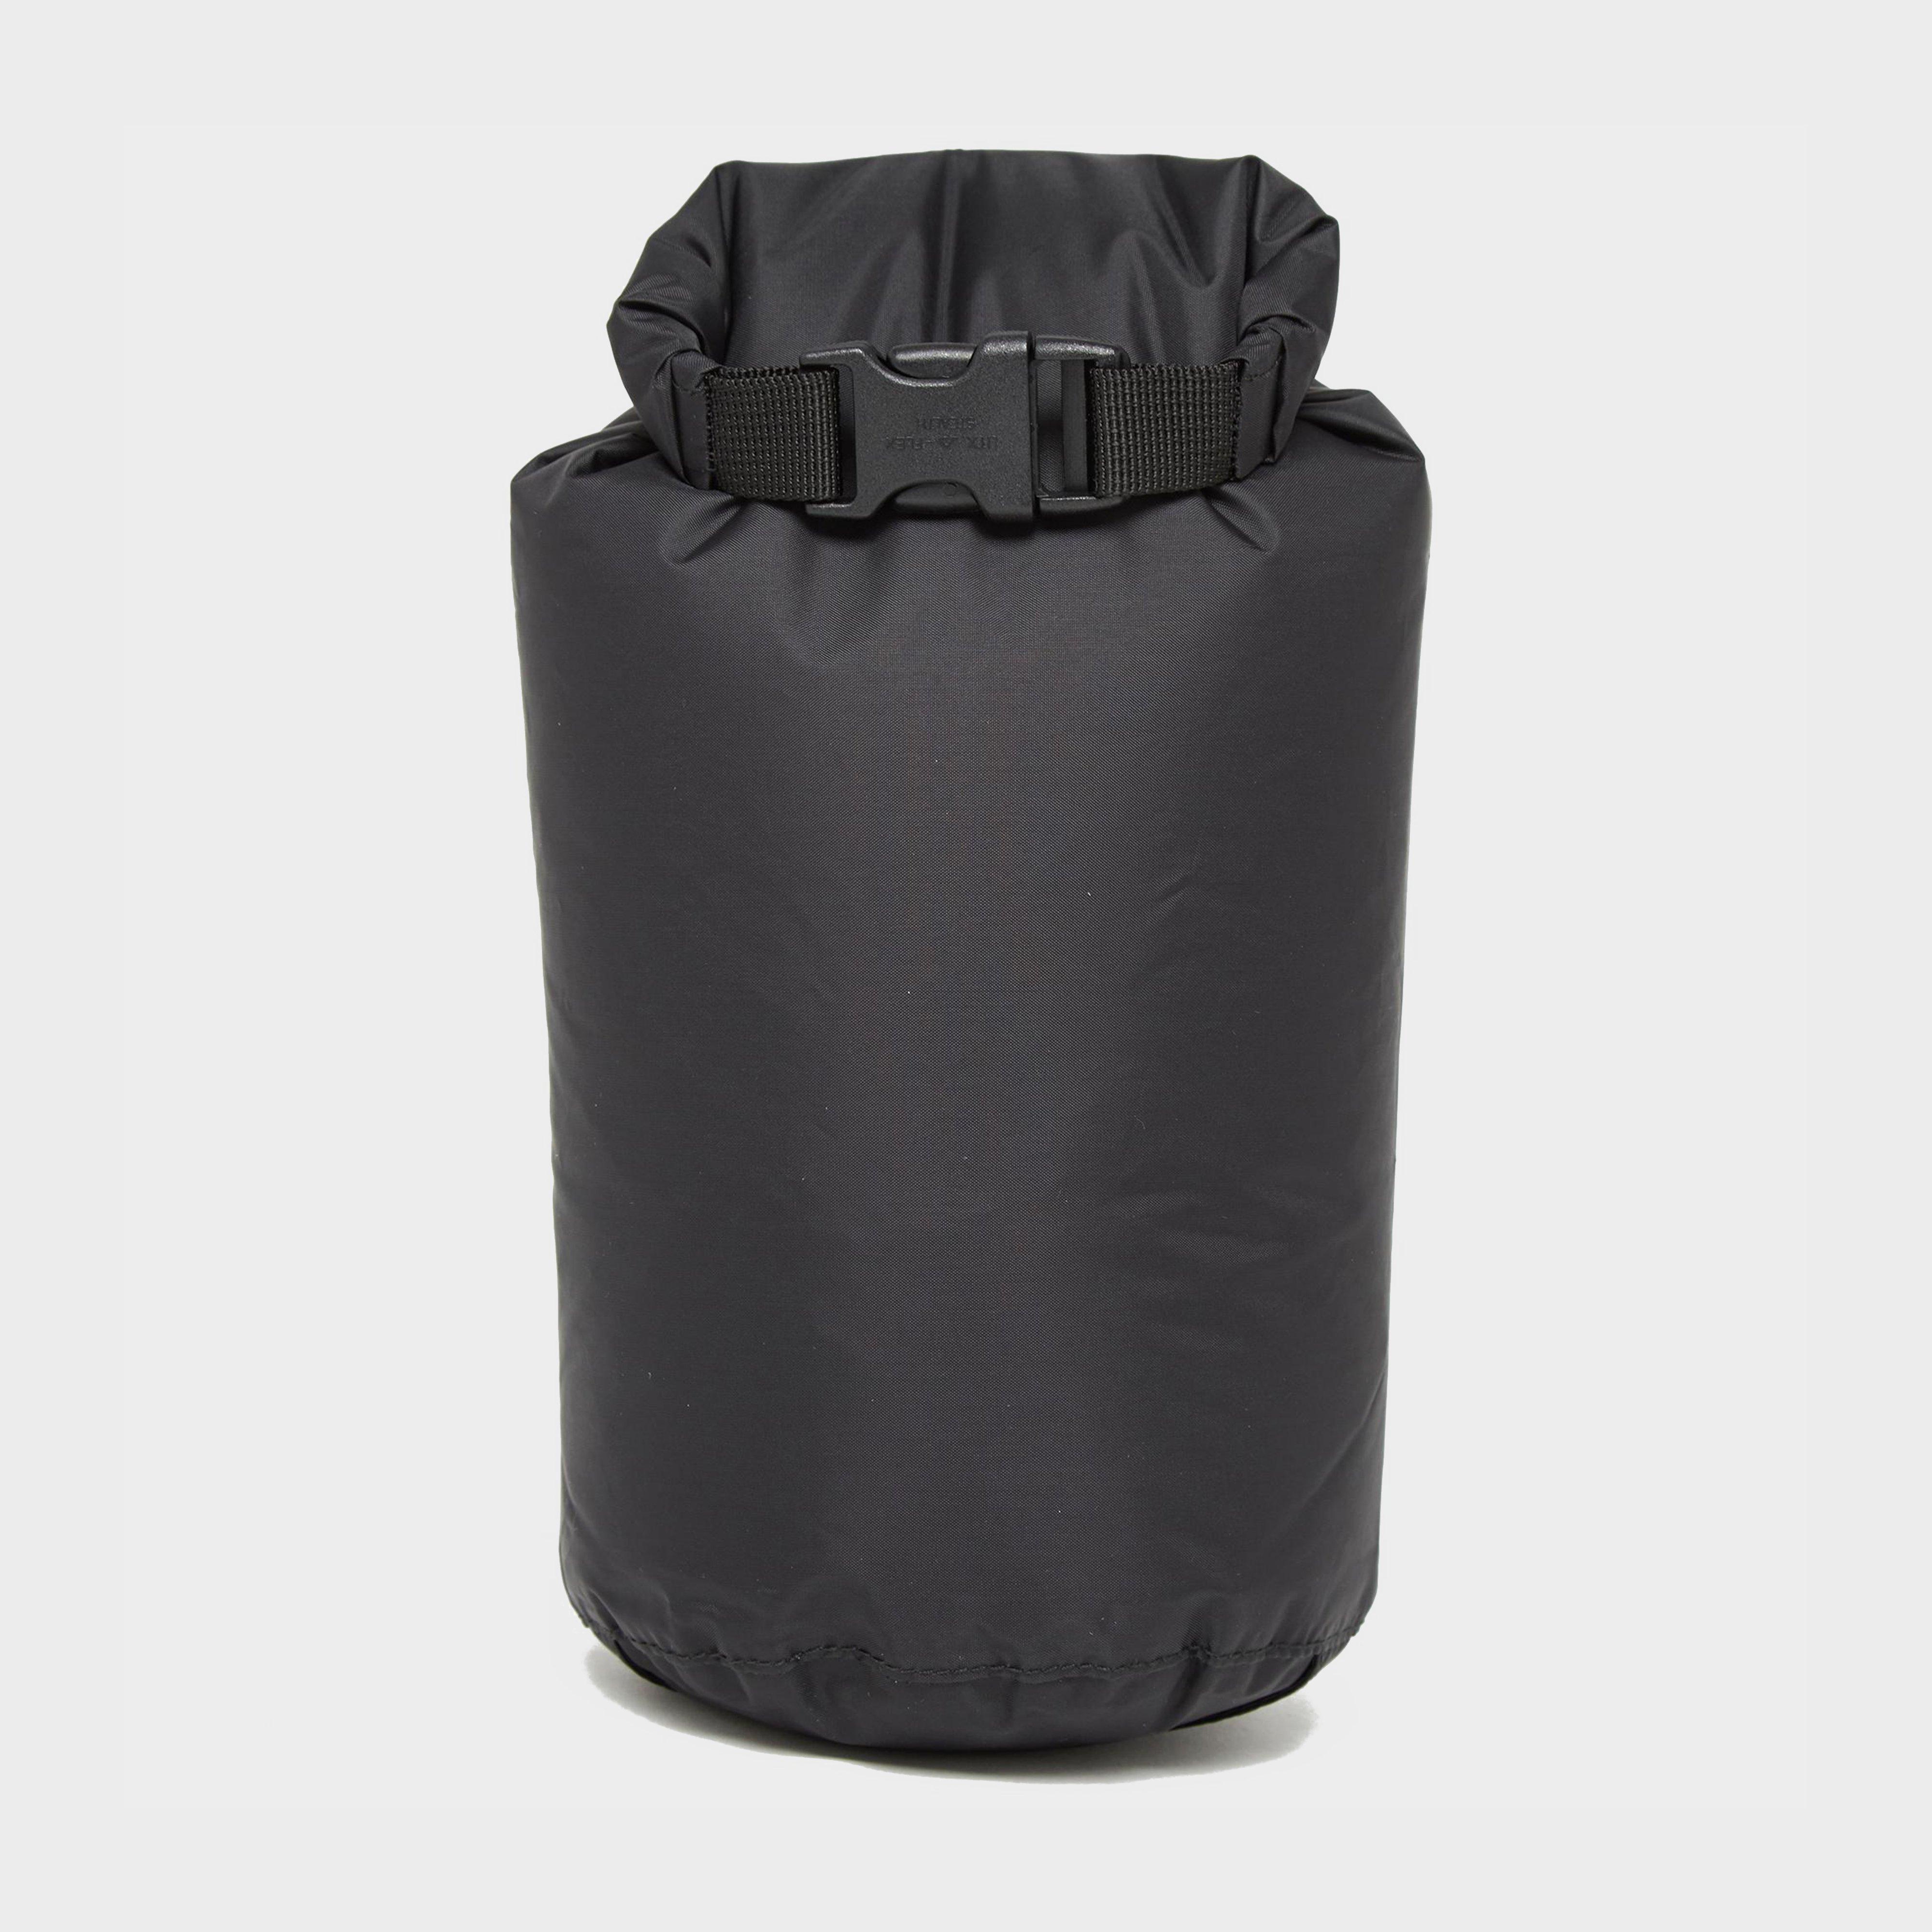 Exped Expedition 3L Dry Fold Bag - Black, Black